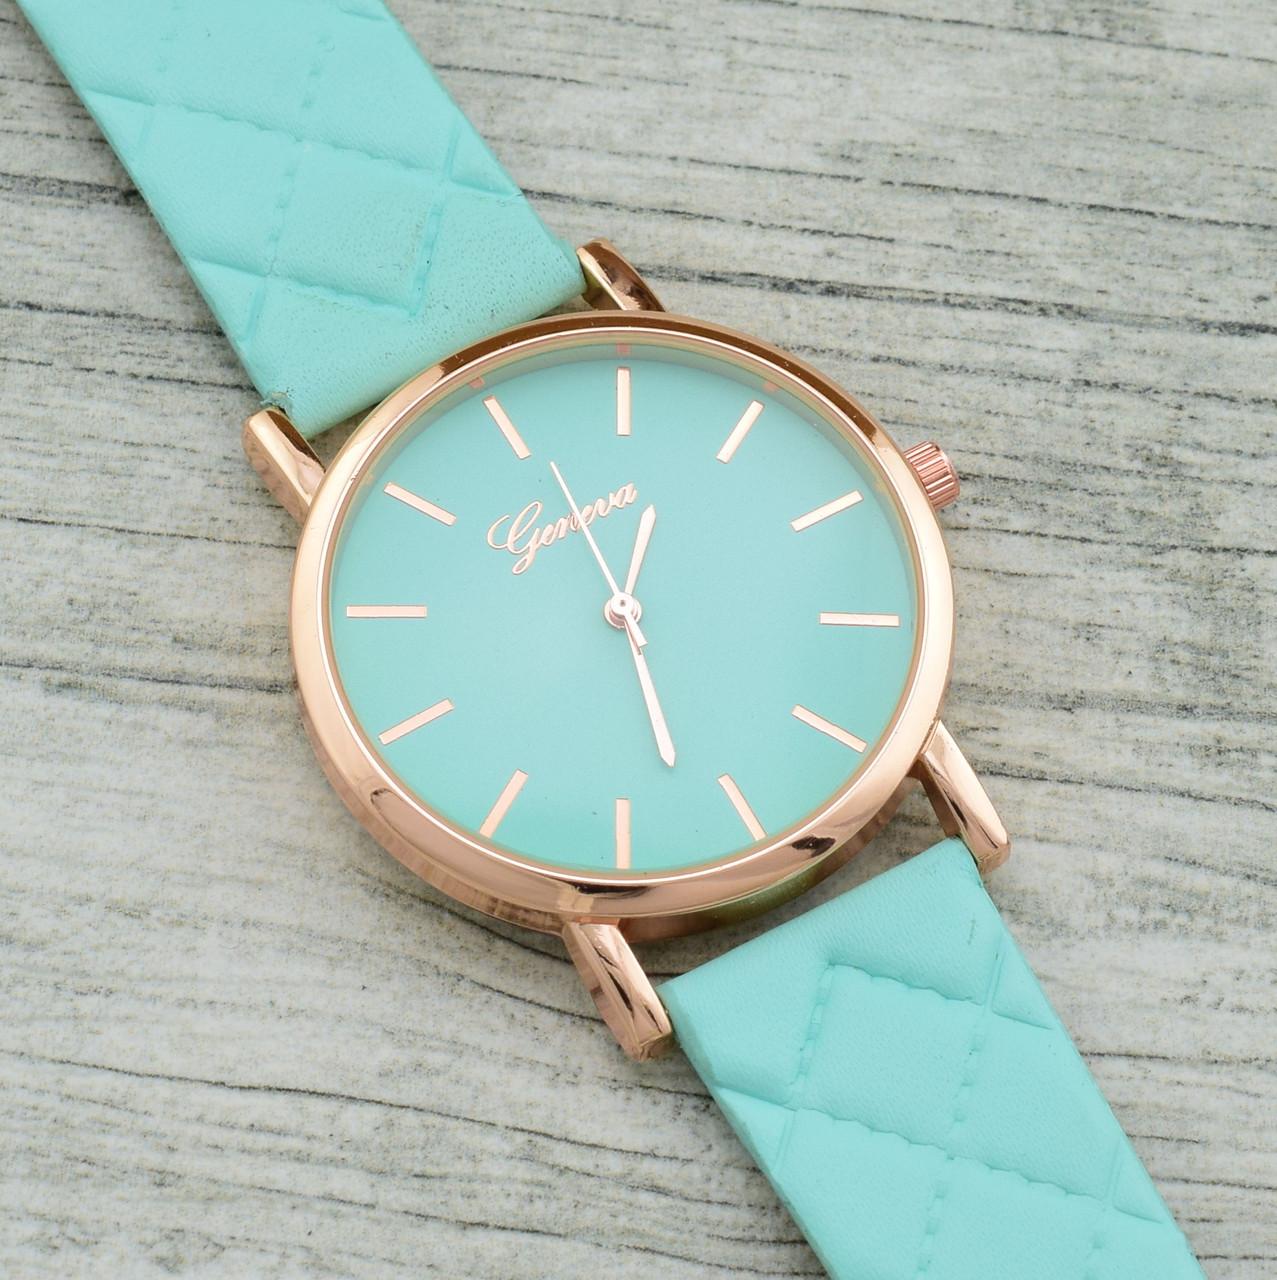 Часы G-080 диаметр циферблата 3.8 см, длина ремешка 17-21 см, мятный цвет, позолота РО